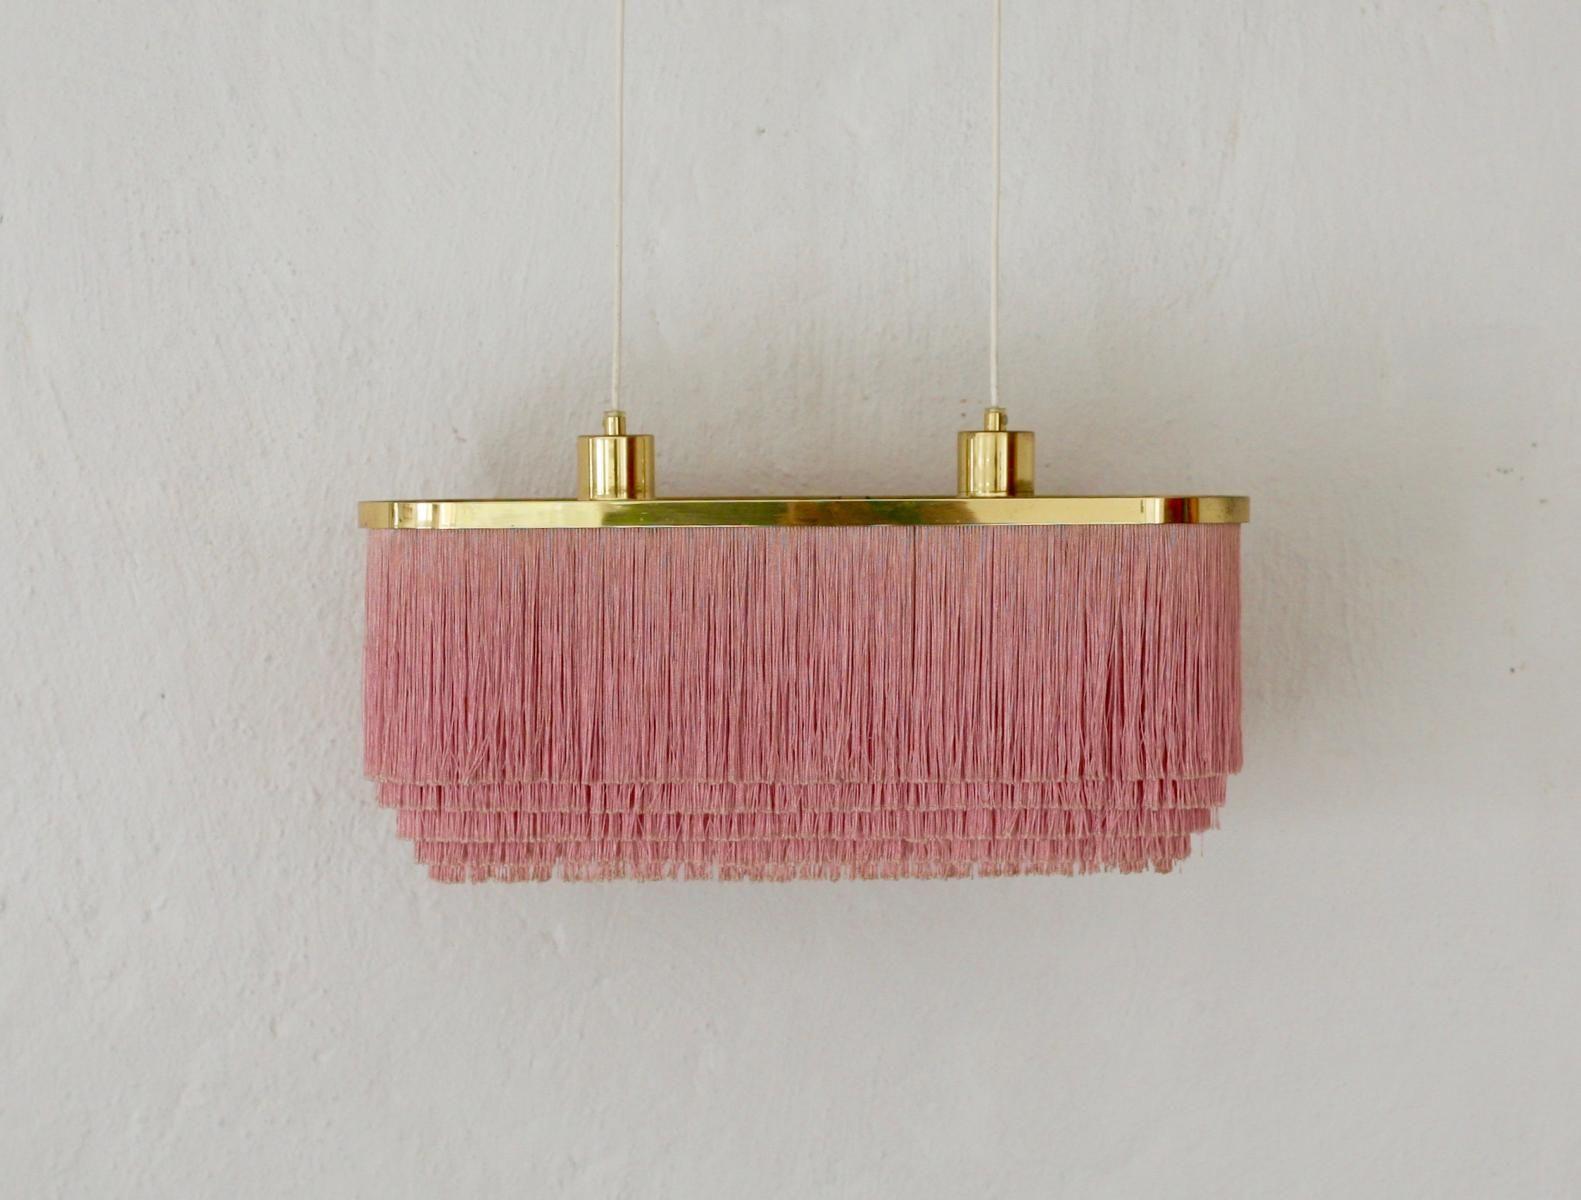 t 607 fransen lampe von hans agne jakobsson 1963 1 id. Black Bedroom Furniture Sets. Home Design Ideas